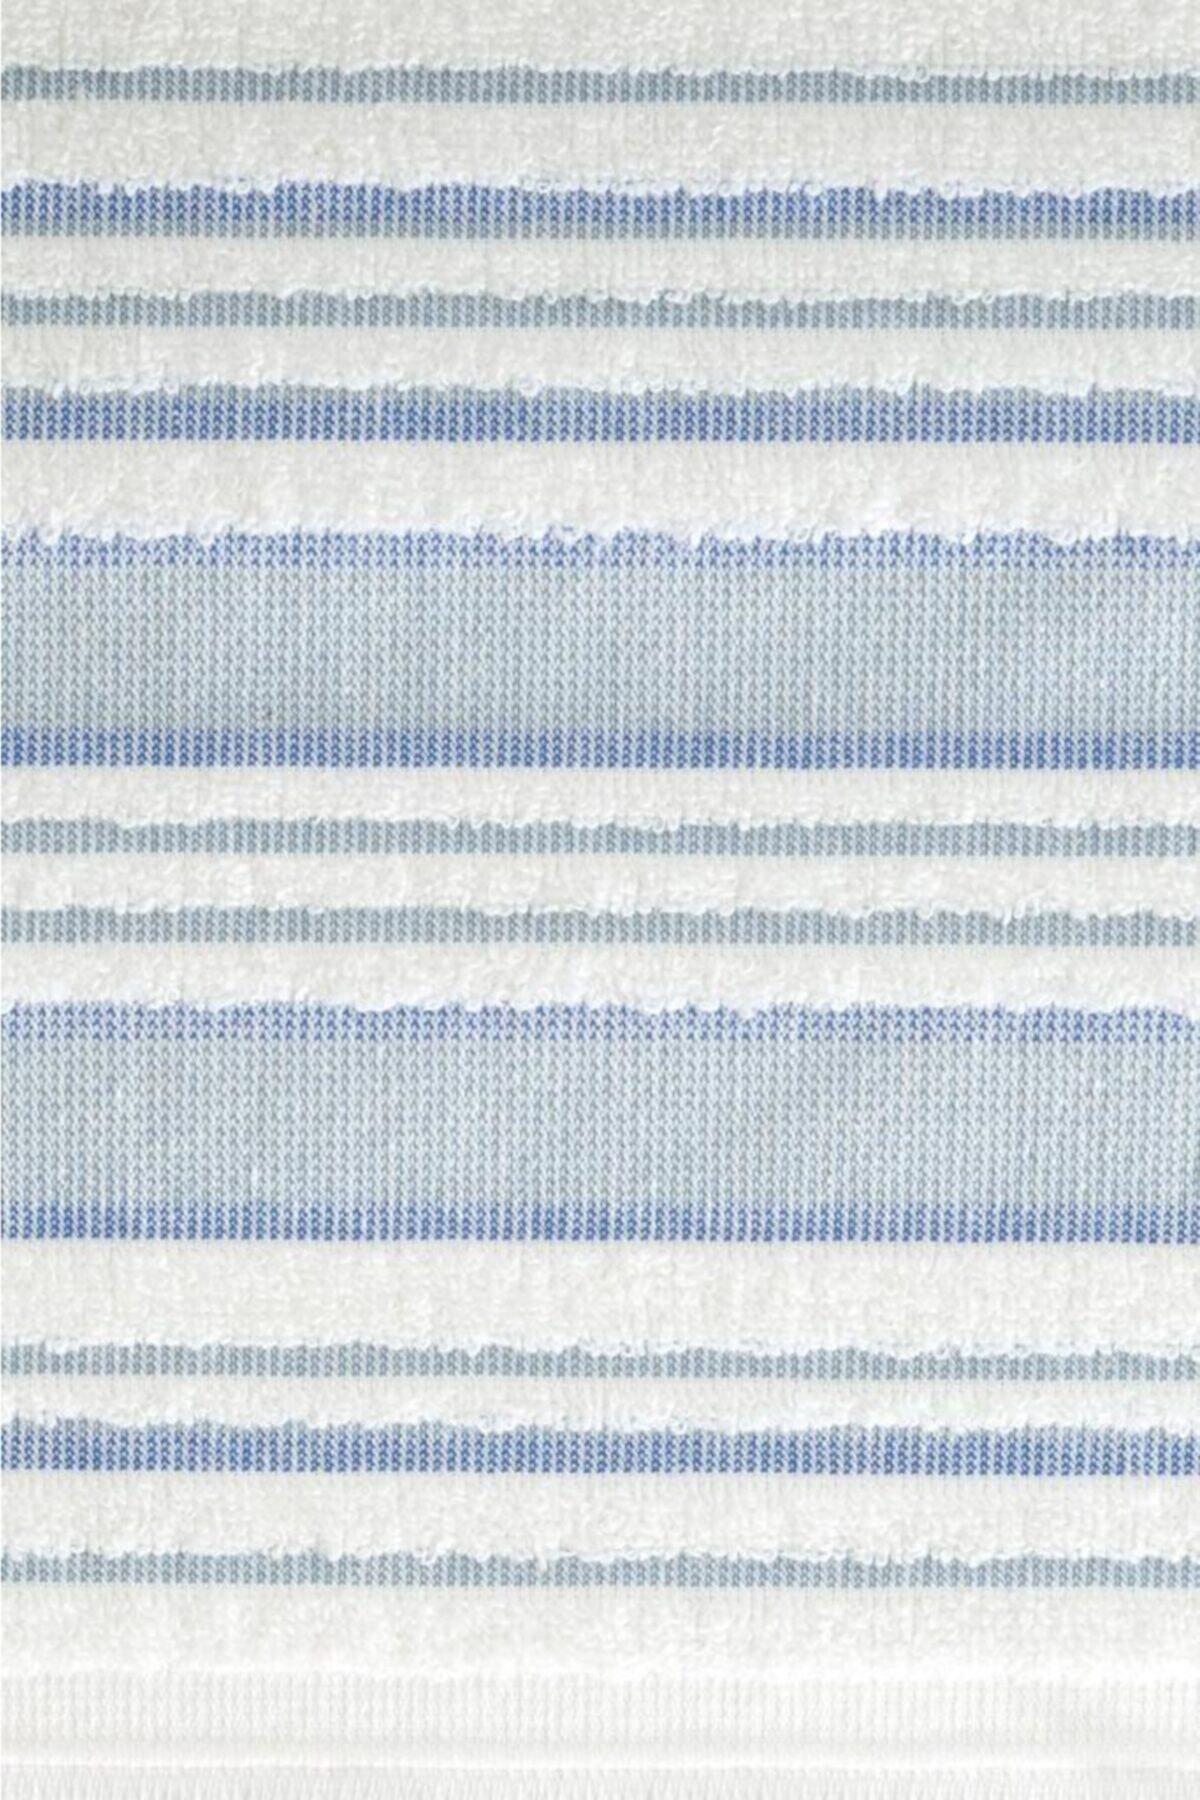 Louis Marie Mavi Banyo Havlu Takımı 70x140  50x90 2